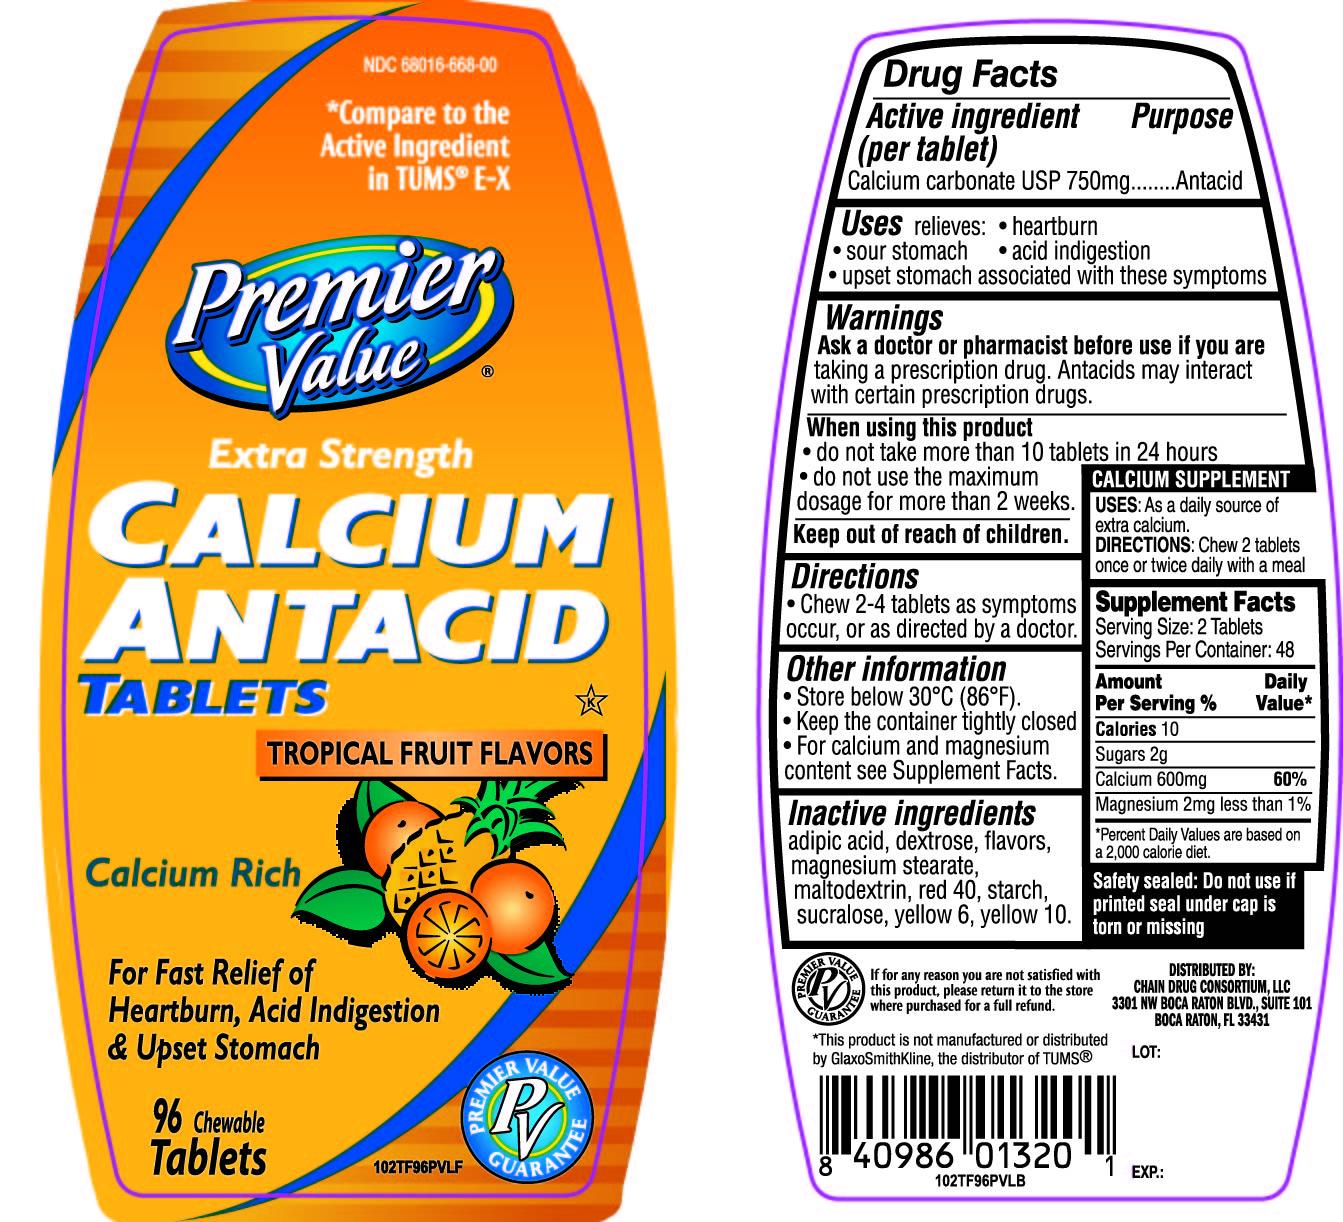 Premier Value Extra Strength Tropical Fruit Antacid Tablets